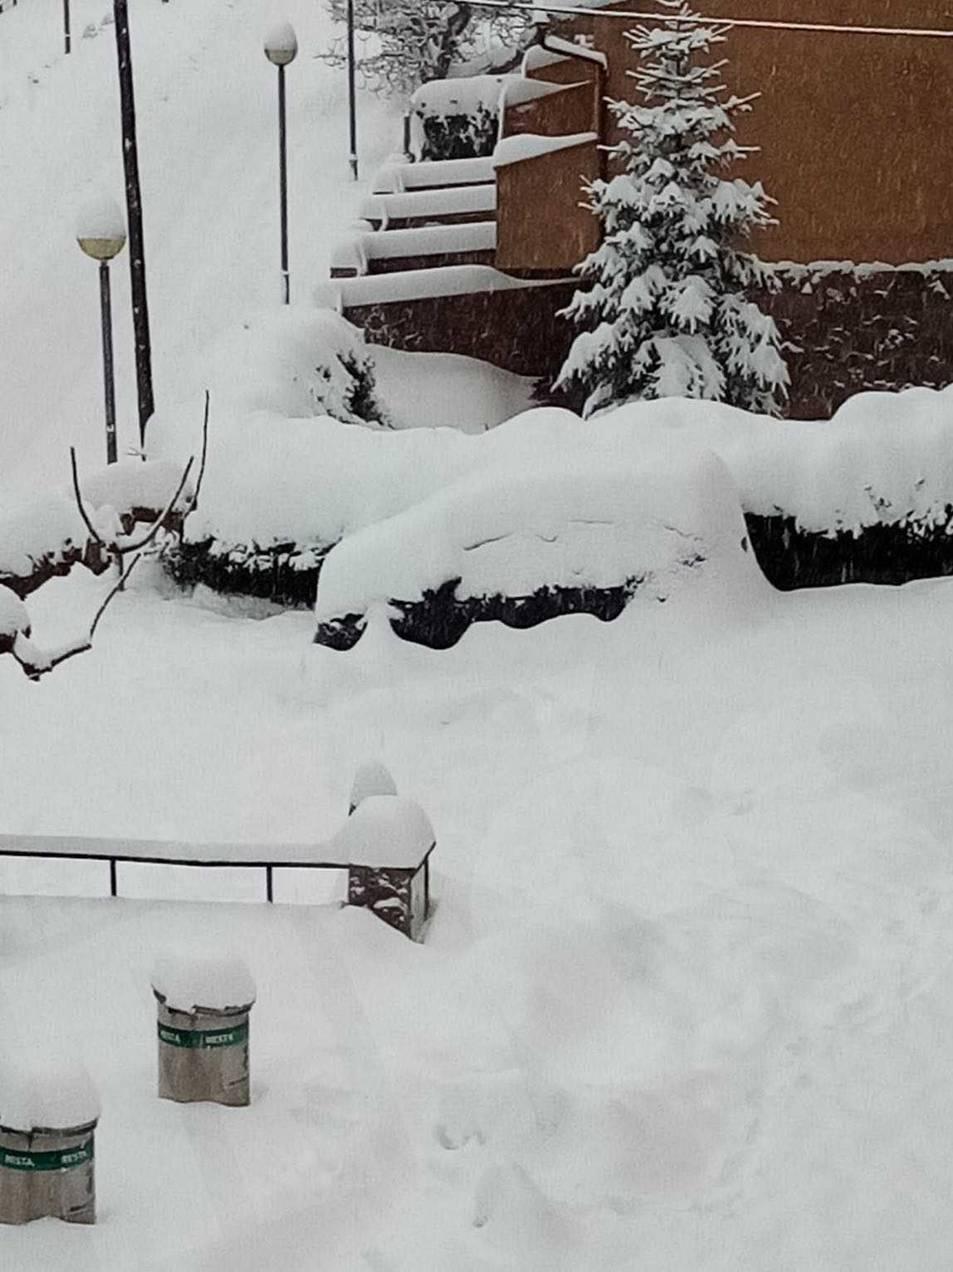 Nevada a Prades, la neu es consolida